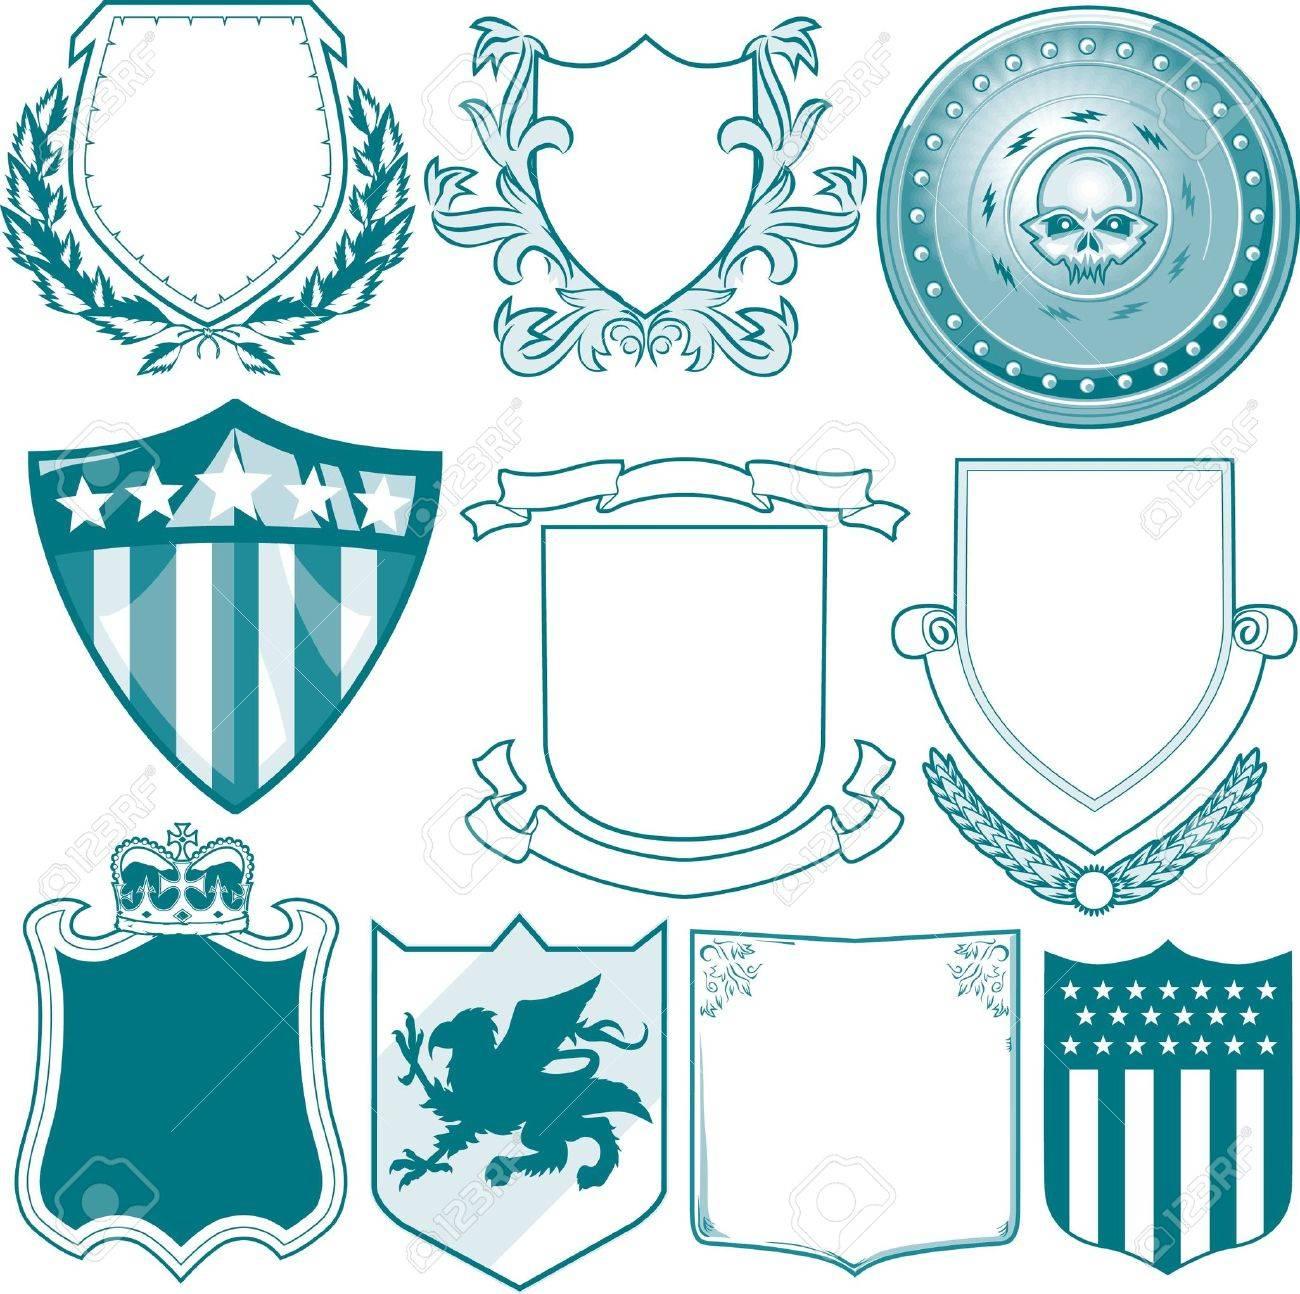 Shield Collection Stock Vector - 13232388